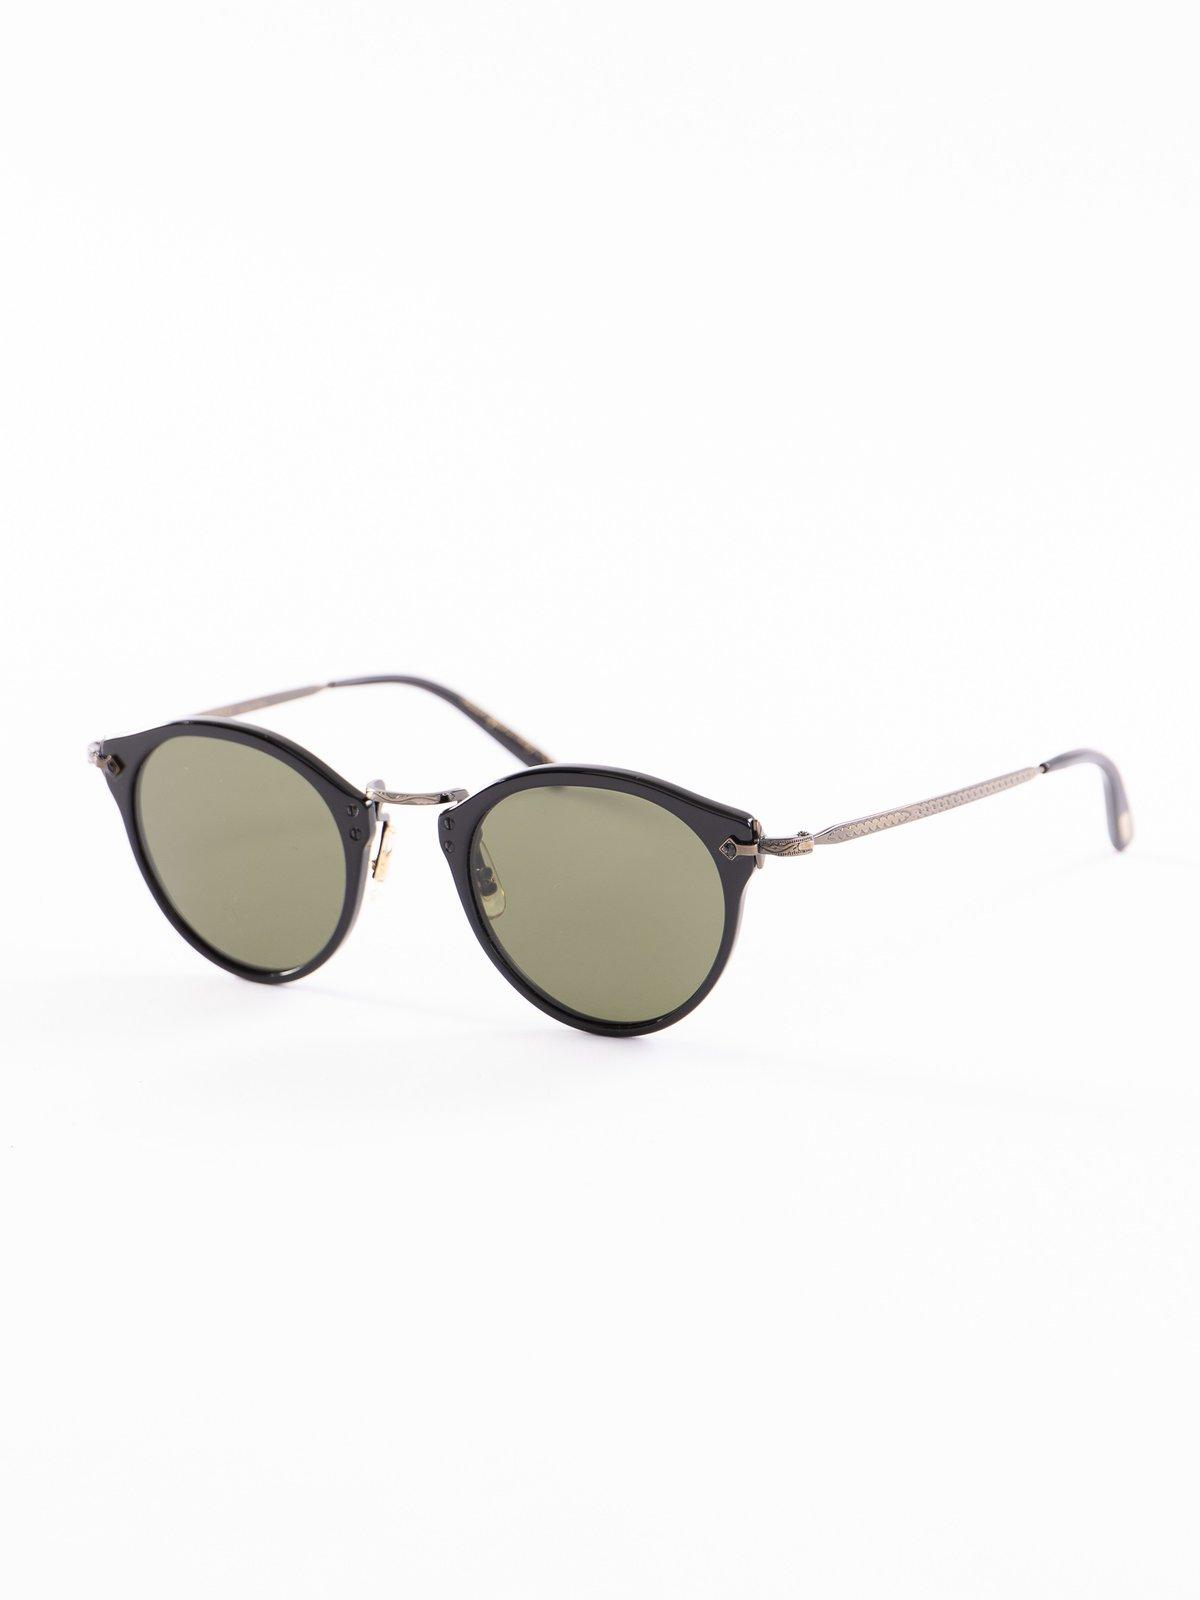 Black–Antique Gold/Green OP–505 Sunglasses - Image 2